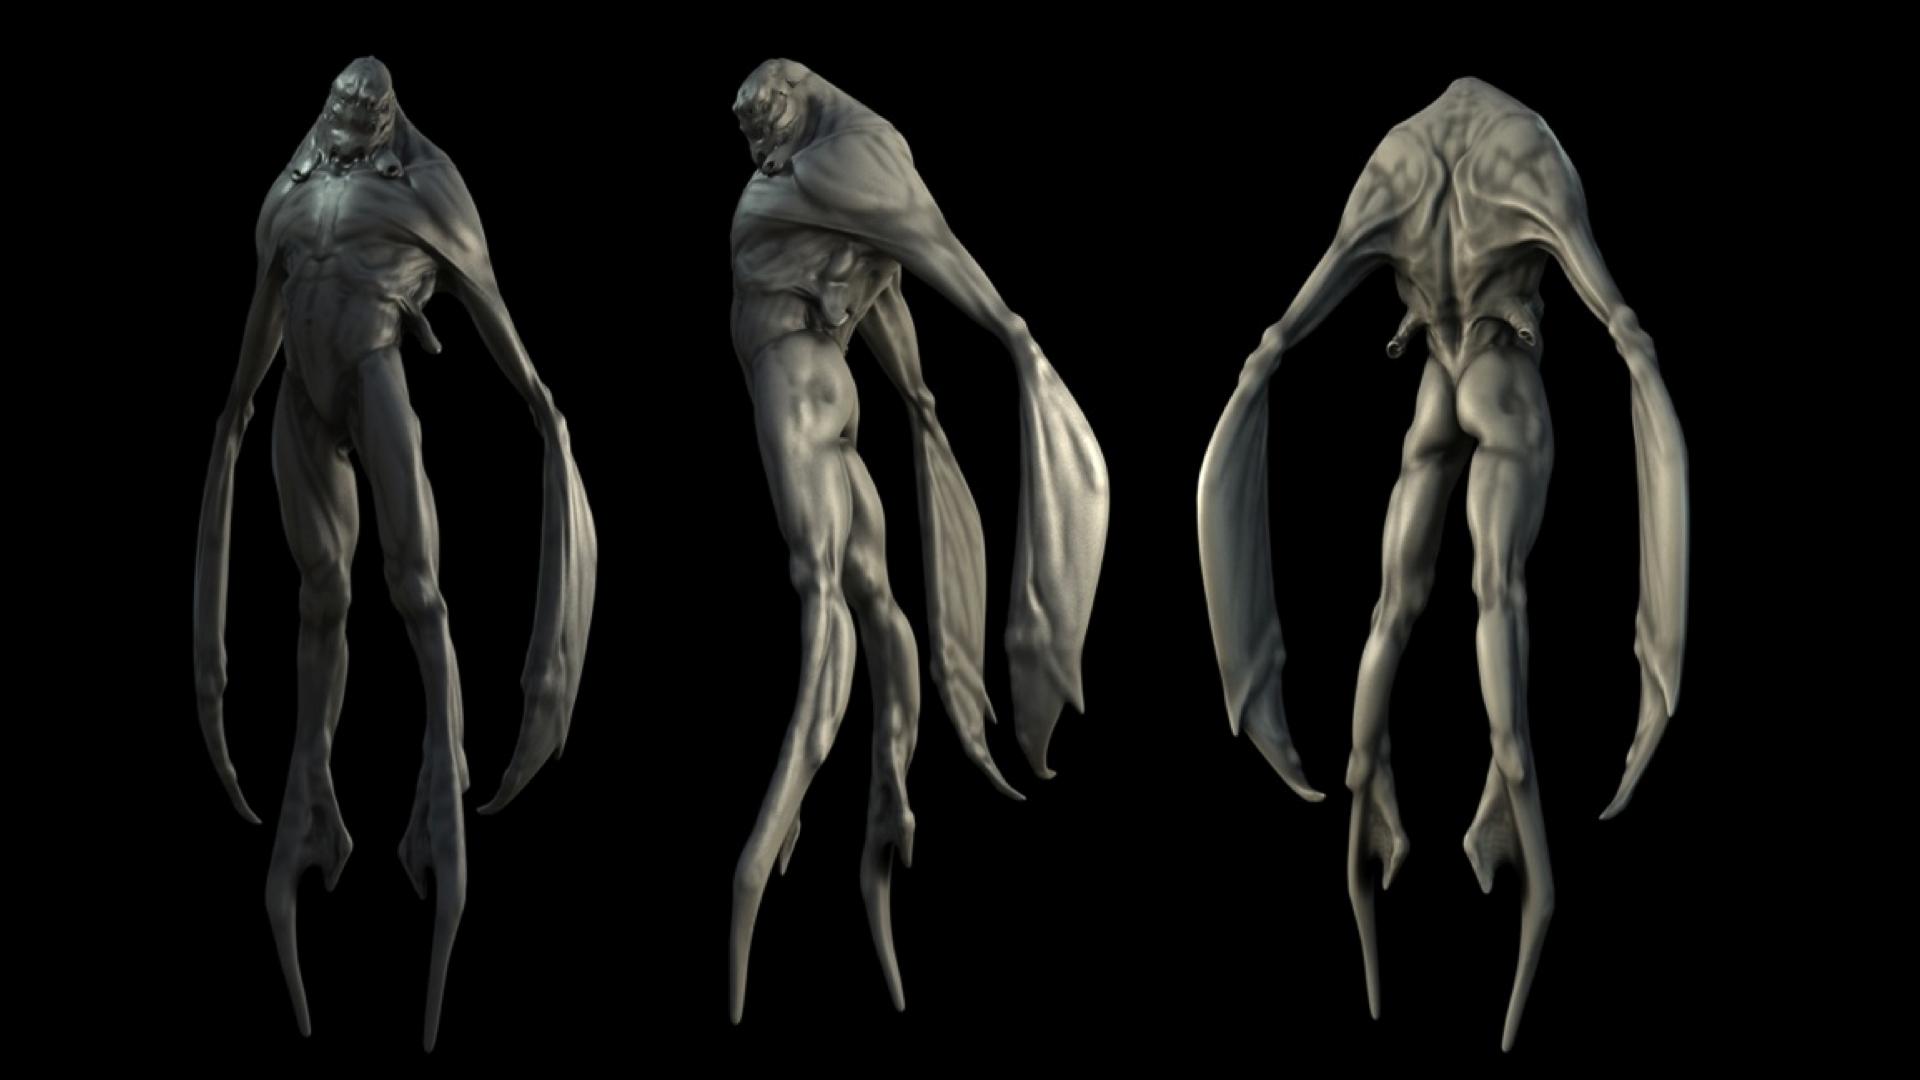 Cloverfield Vs Super 8 Monster | www.pixshark.com - Images ...